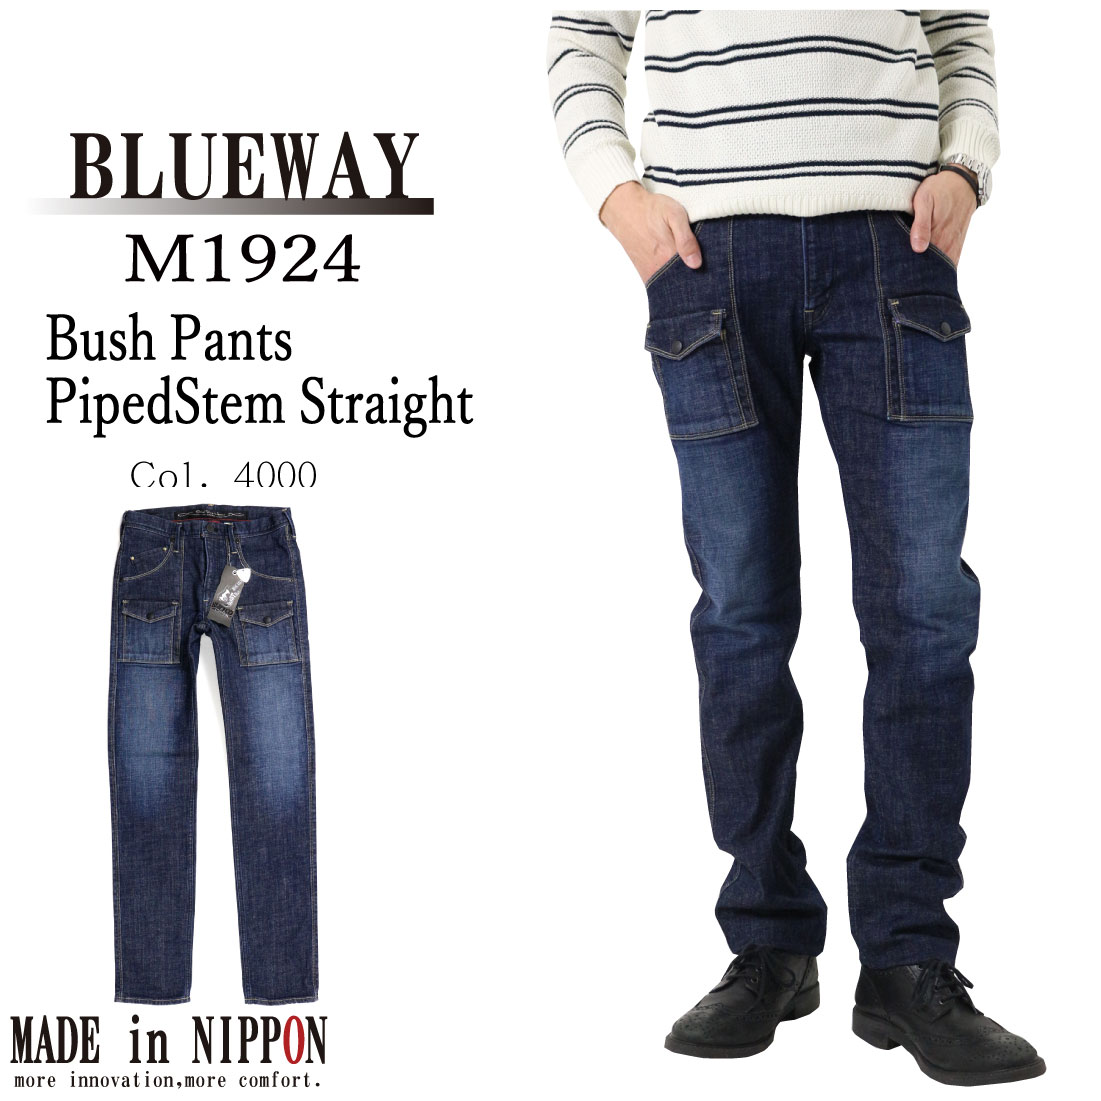 BLUEWAY ブルーウェイ M1924 ジーンズ タイトストレート パイプドステム ブッシュパンツ ビンテージ デニム 4000 メンズ 日本製